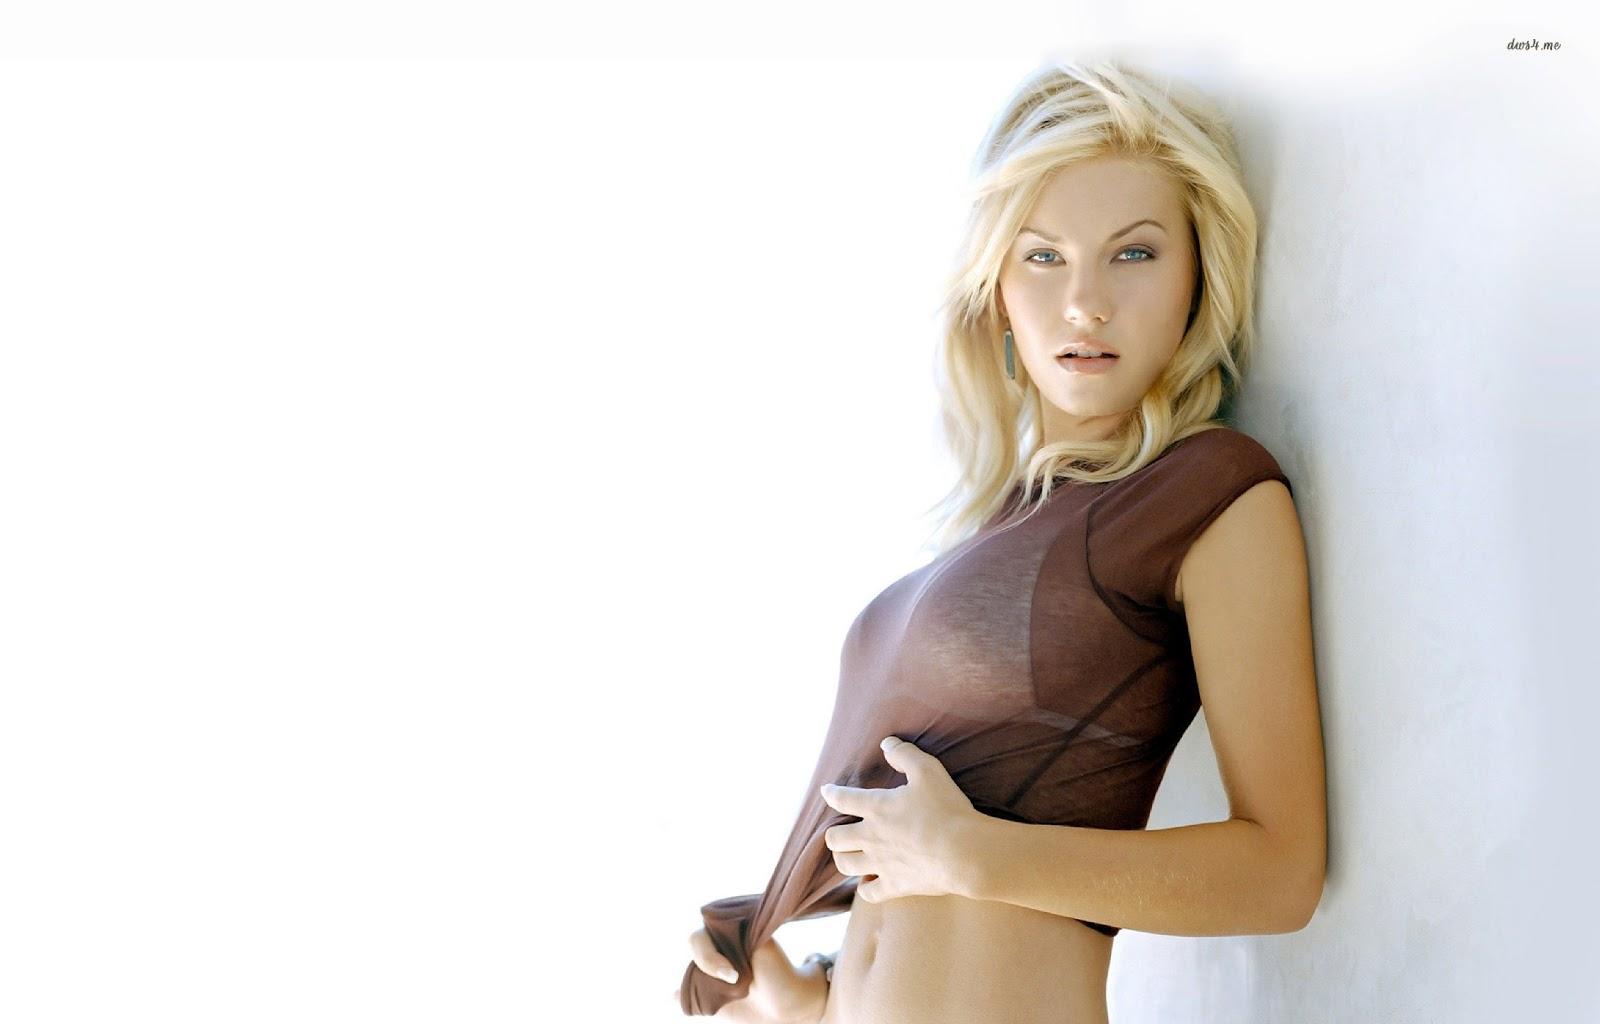 gorgeous actress elisha cuthbert - photo #16